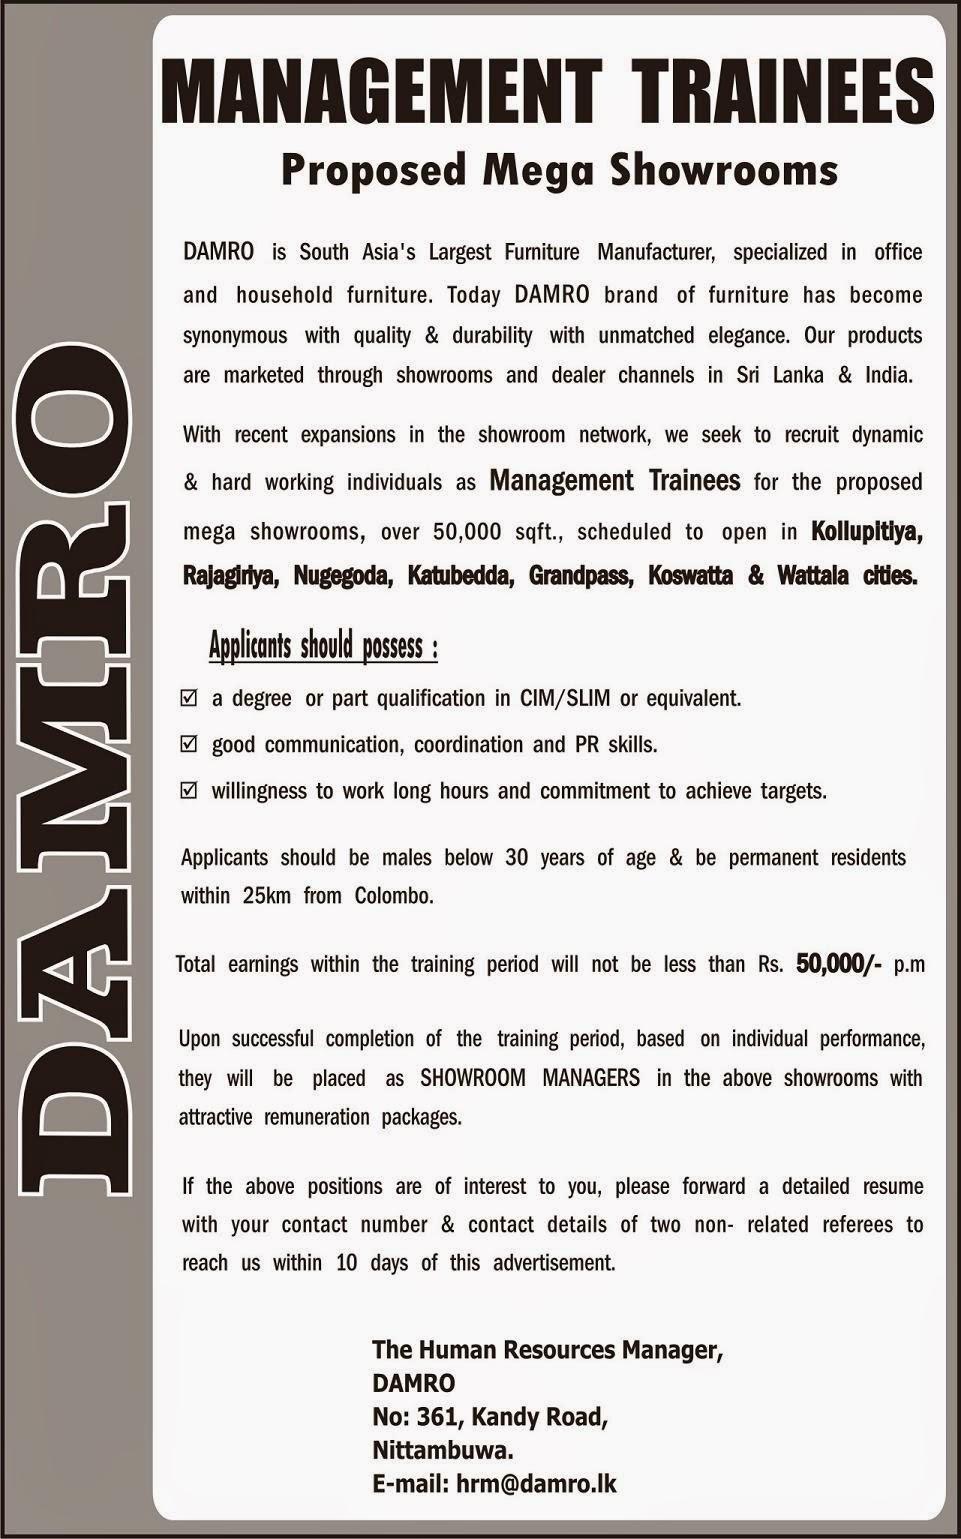 sri lanka vacancies latest vacancies career opportunities management trainees